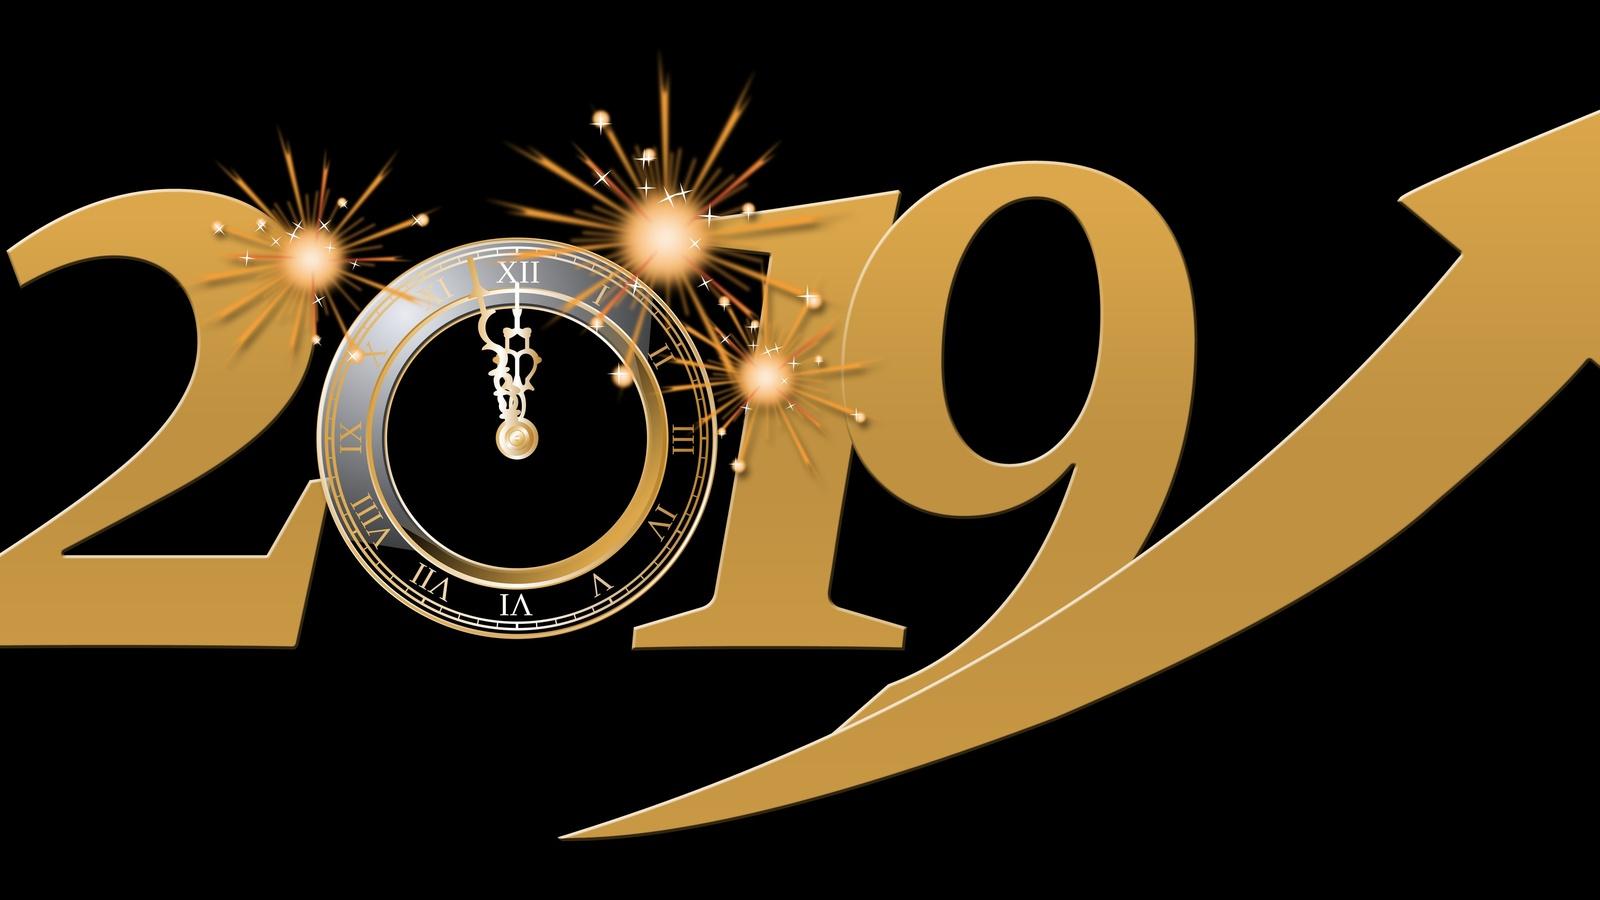 цифры, 2019, часы, циферблат, огни, фон